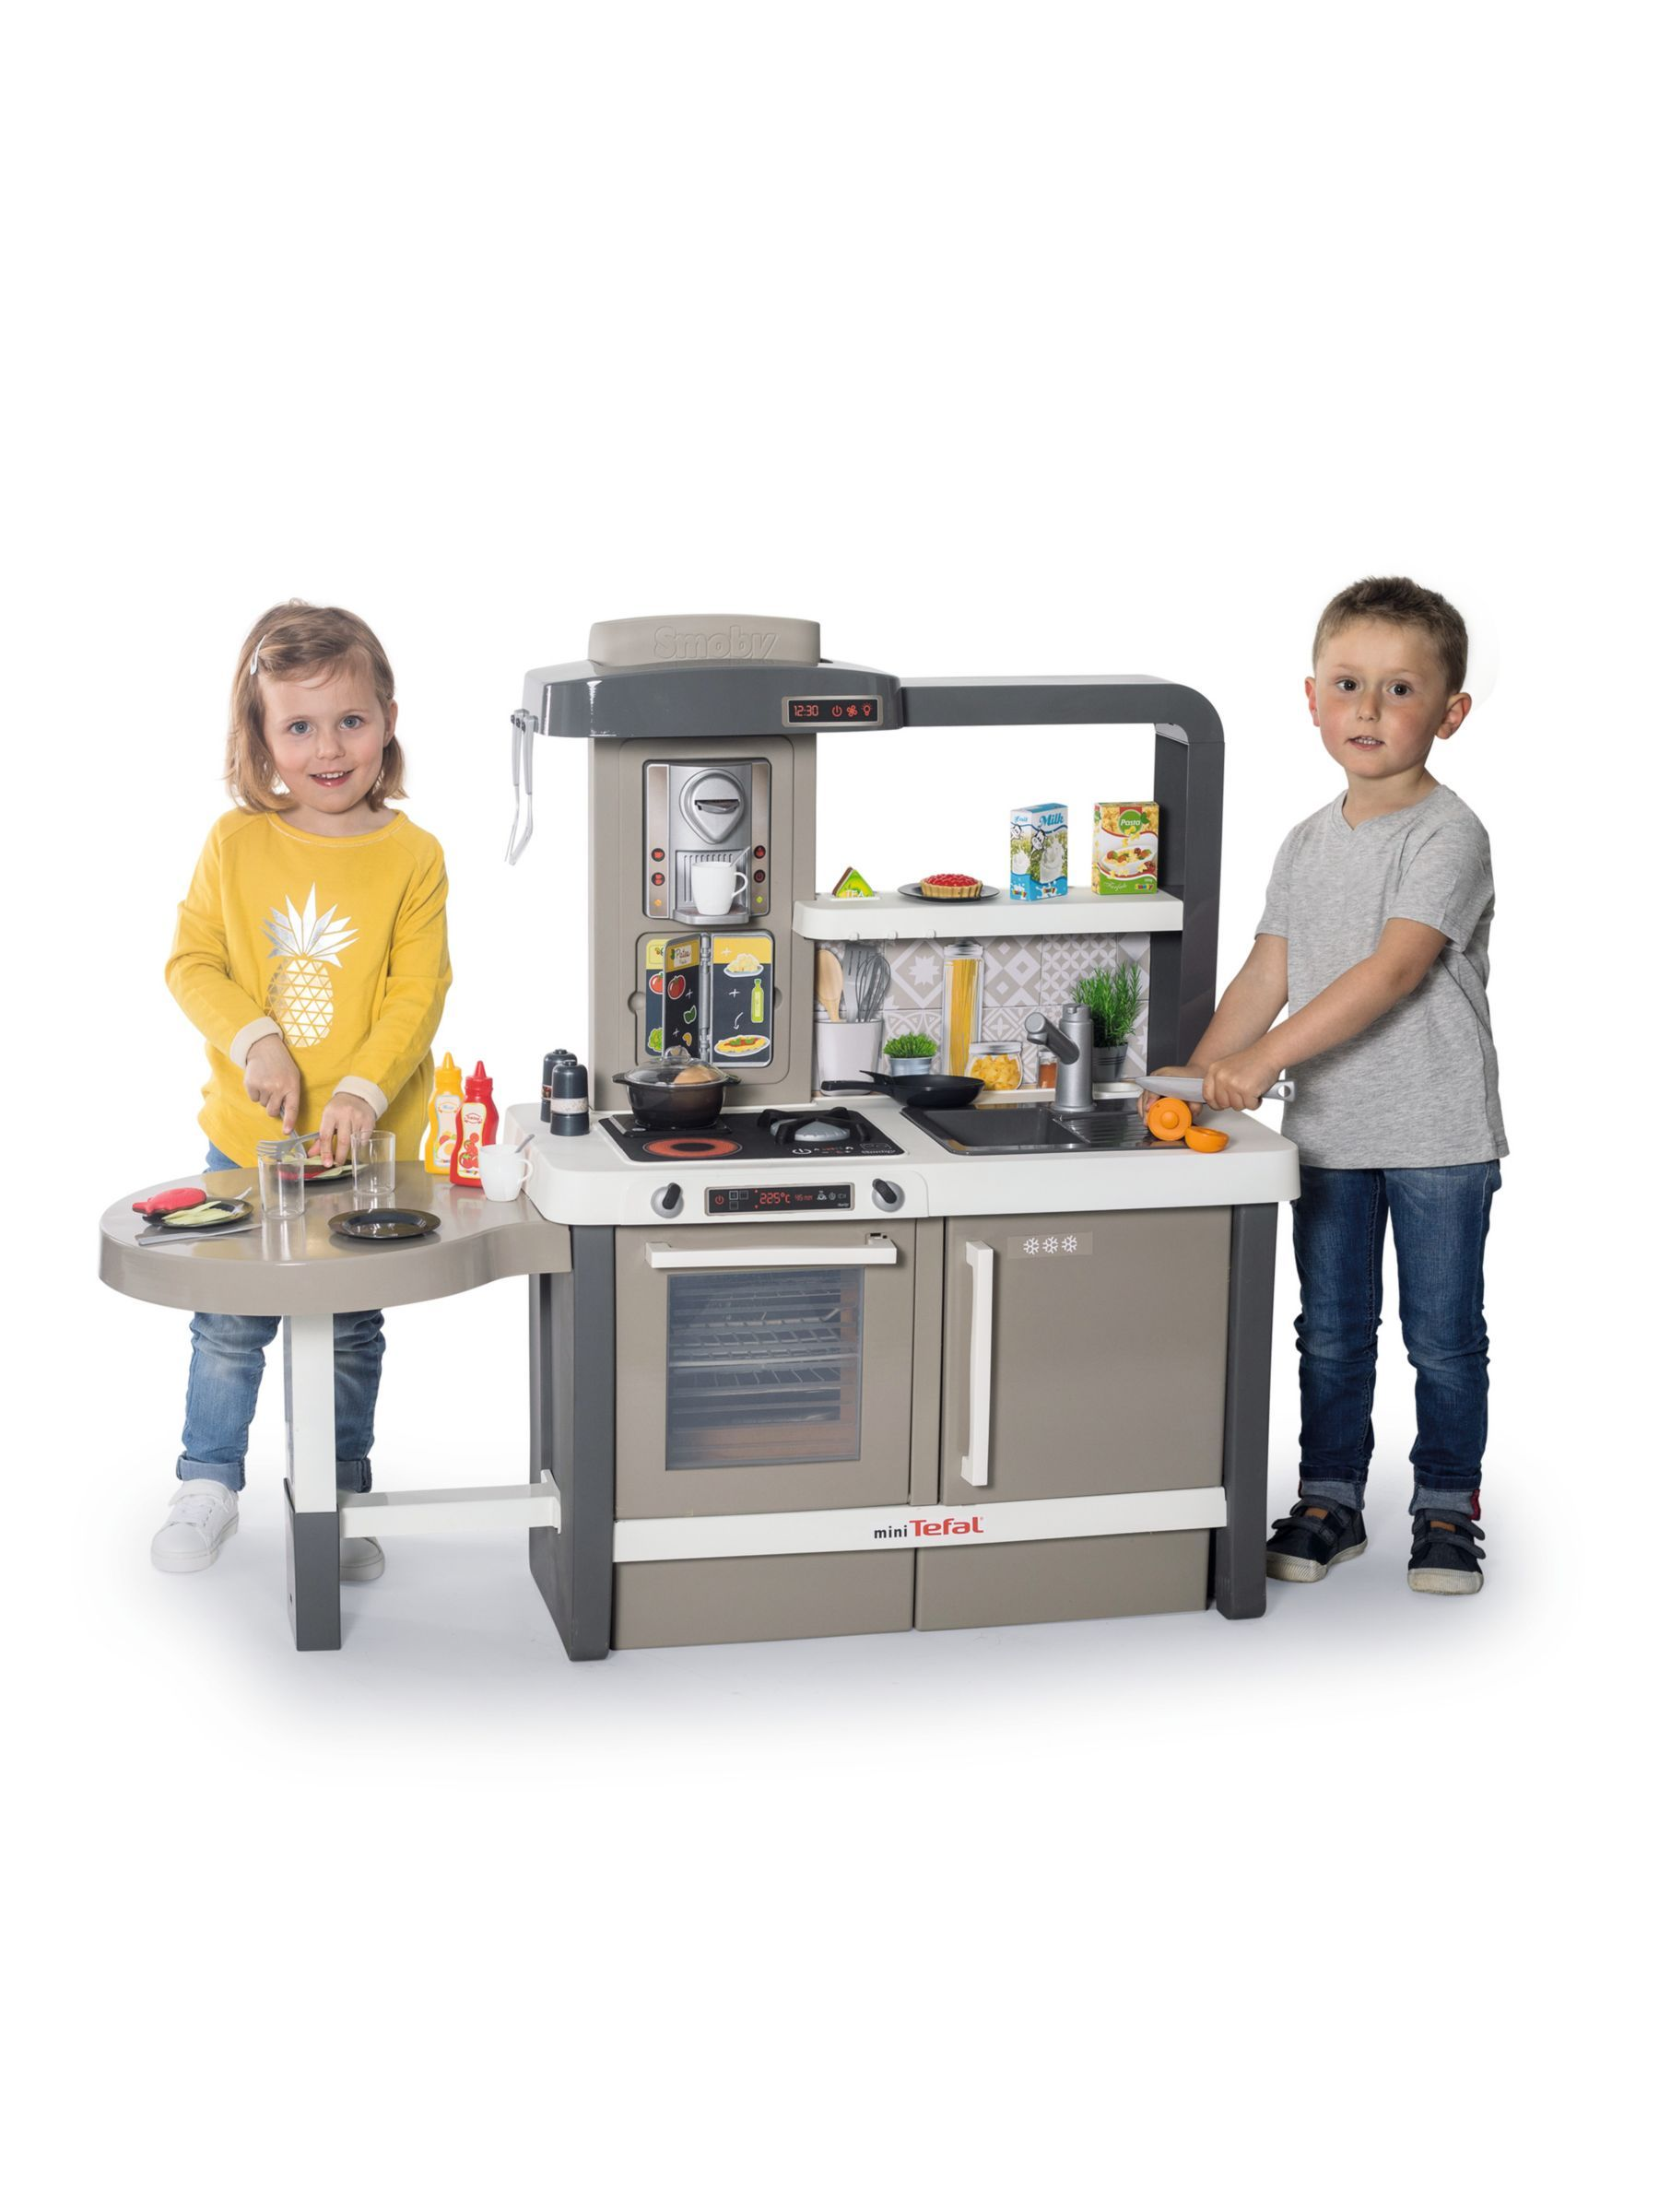 Smoby Tefal Evolving Kitchen Kitchen Countertops Baseboards